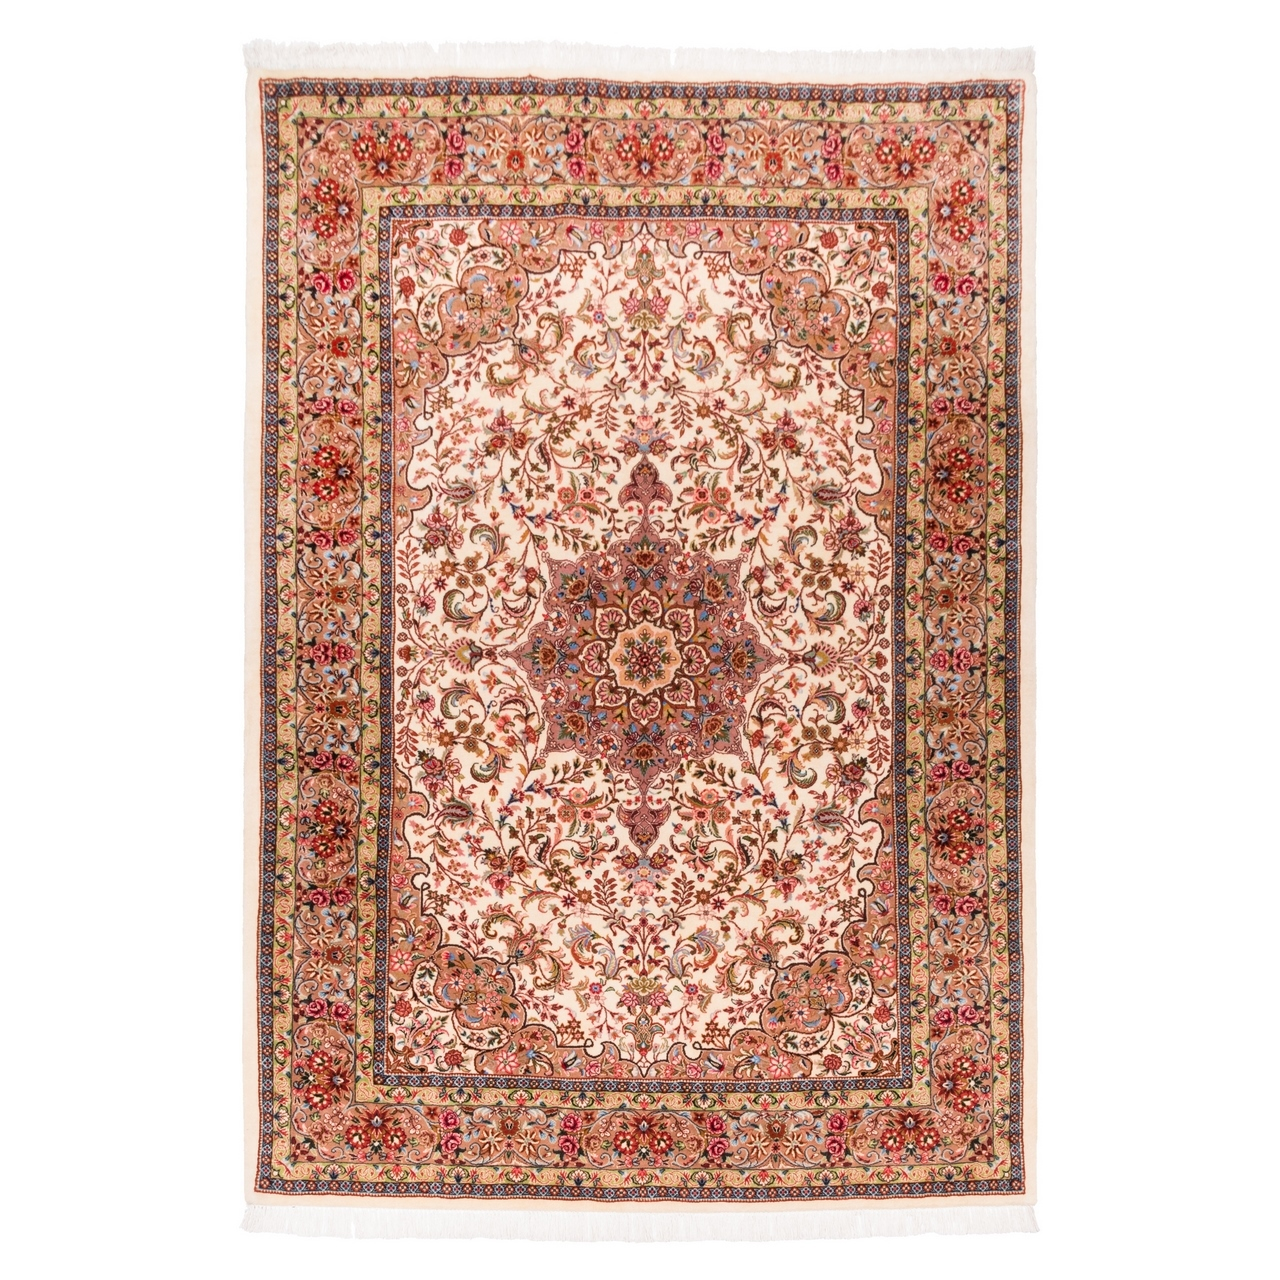 فرش دستباف شش متری سی پرشیا کد 174121